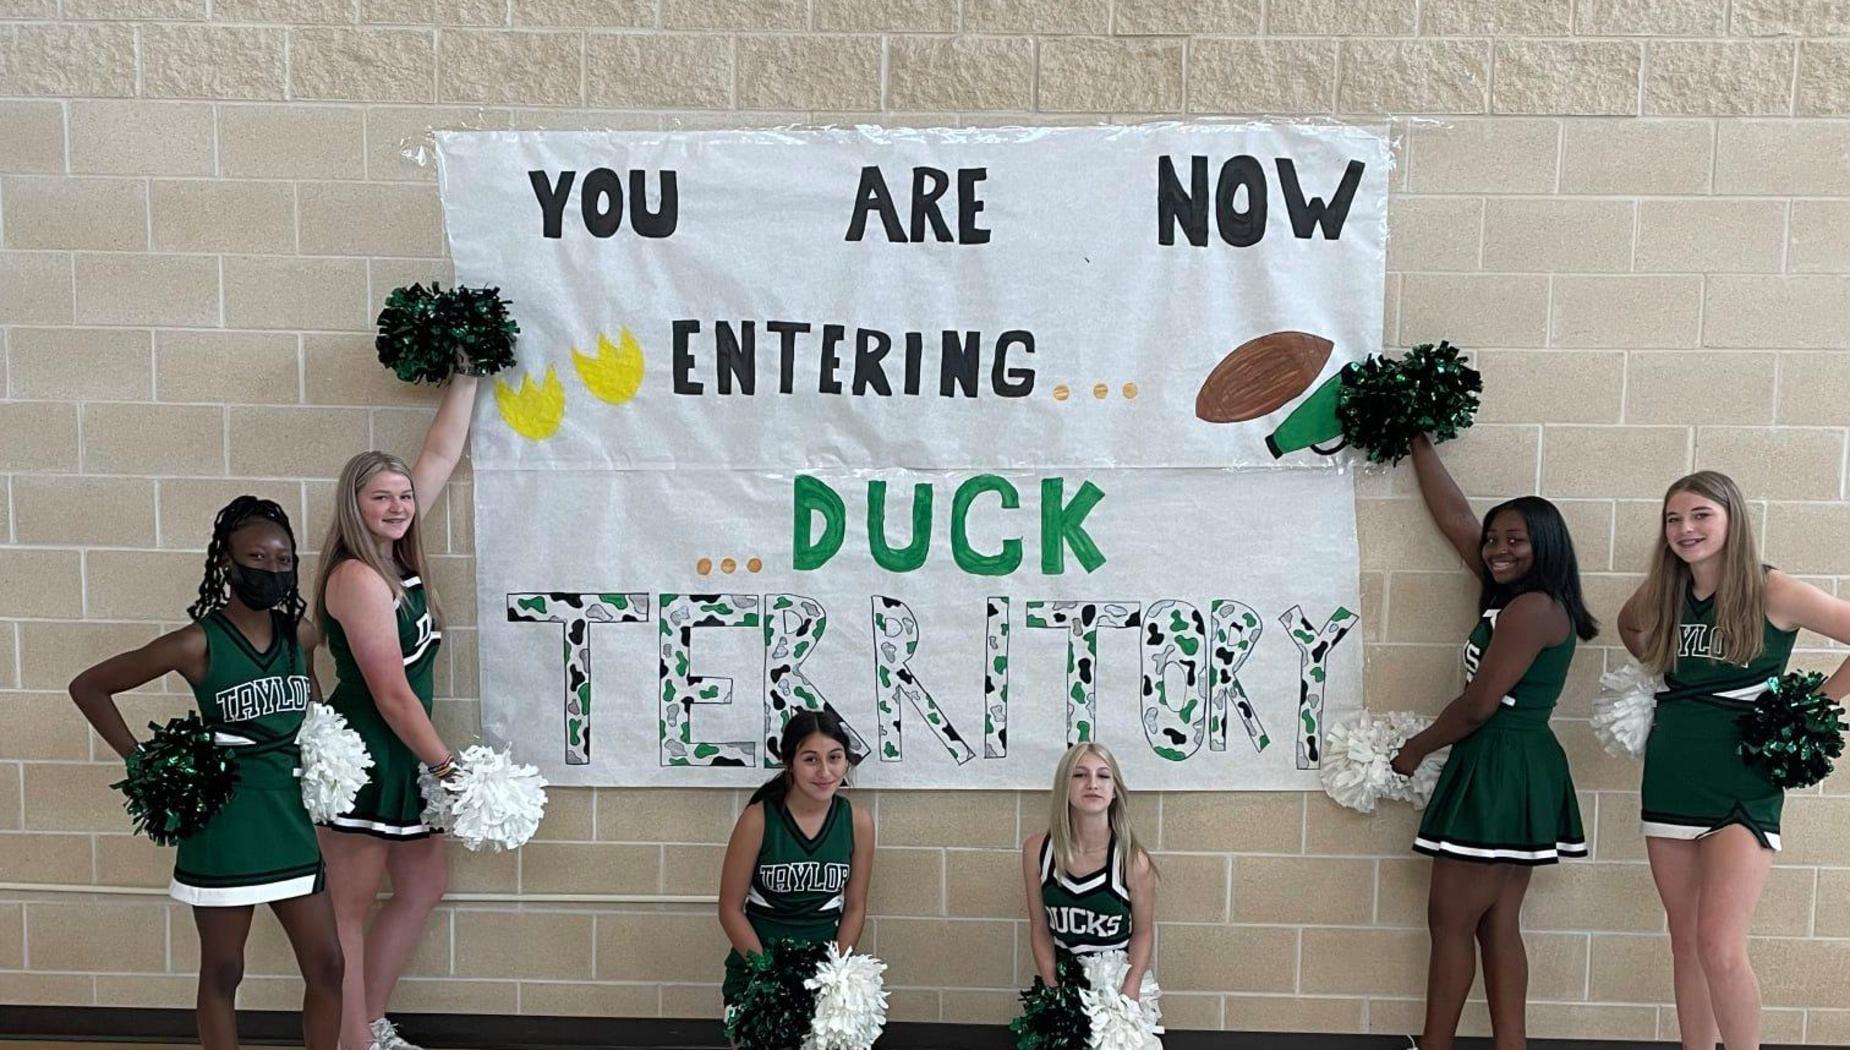 Taylor duck territory cheerleaders